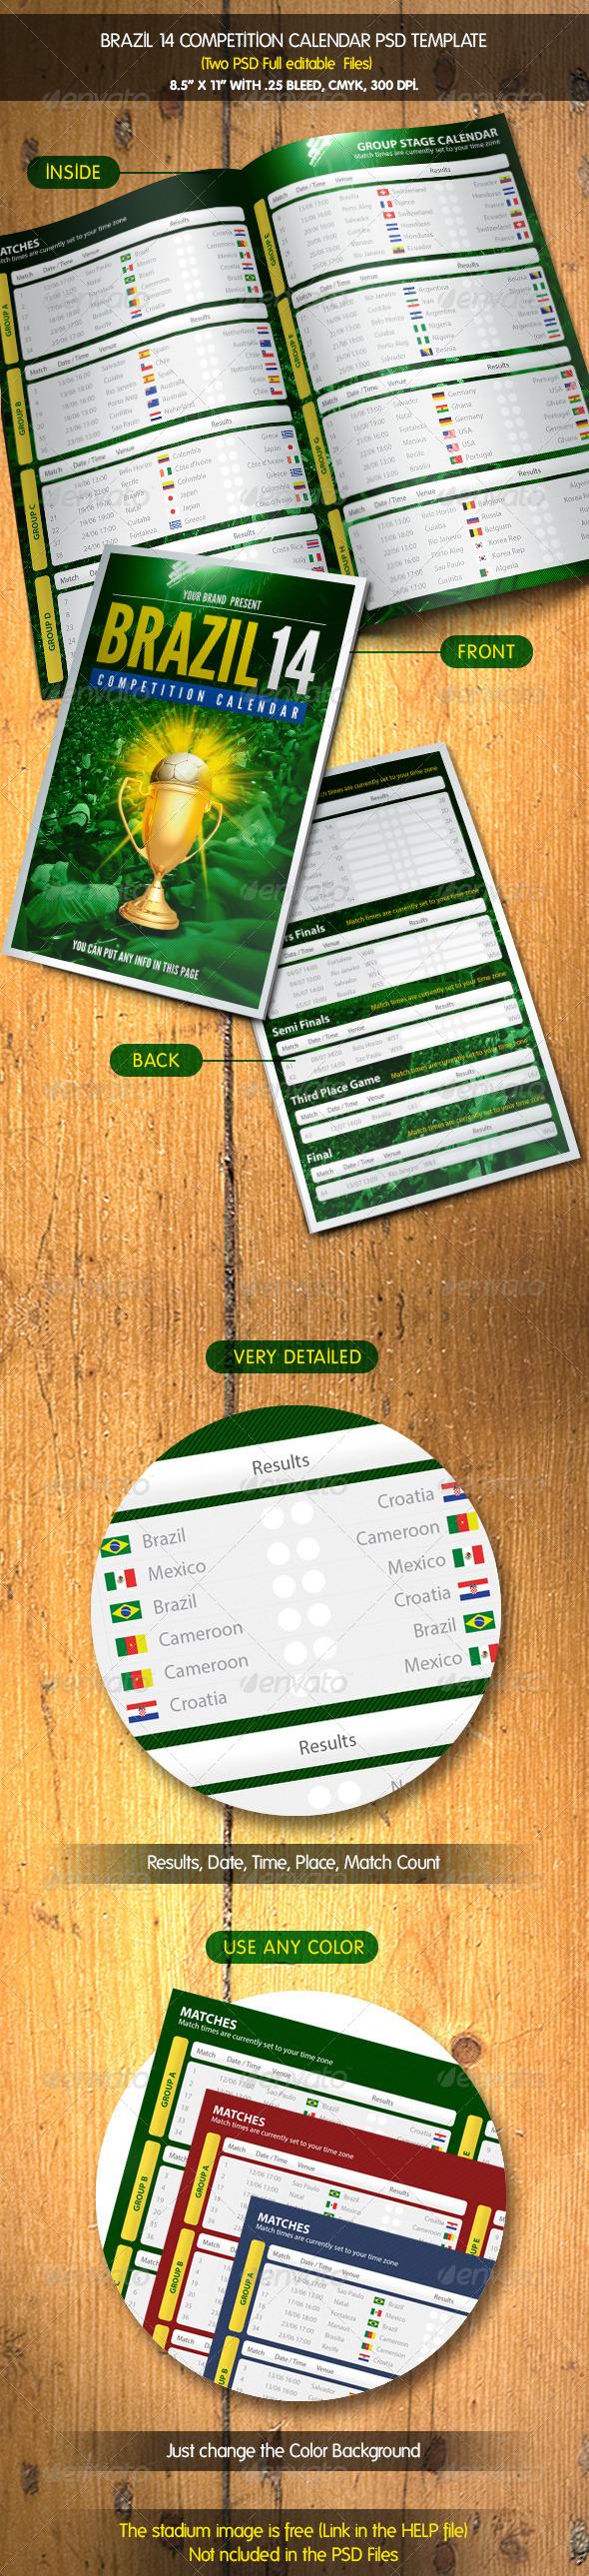 Soccer Brazil 14 Calendar   Match Schedule - Calendars Stationery